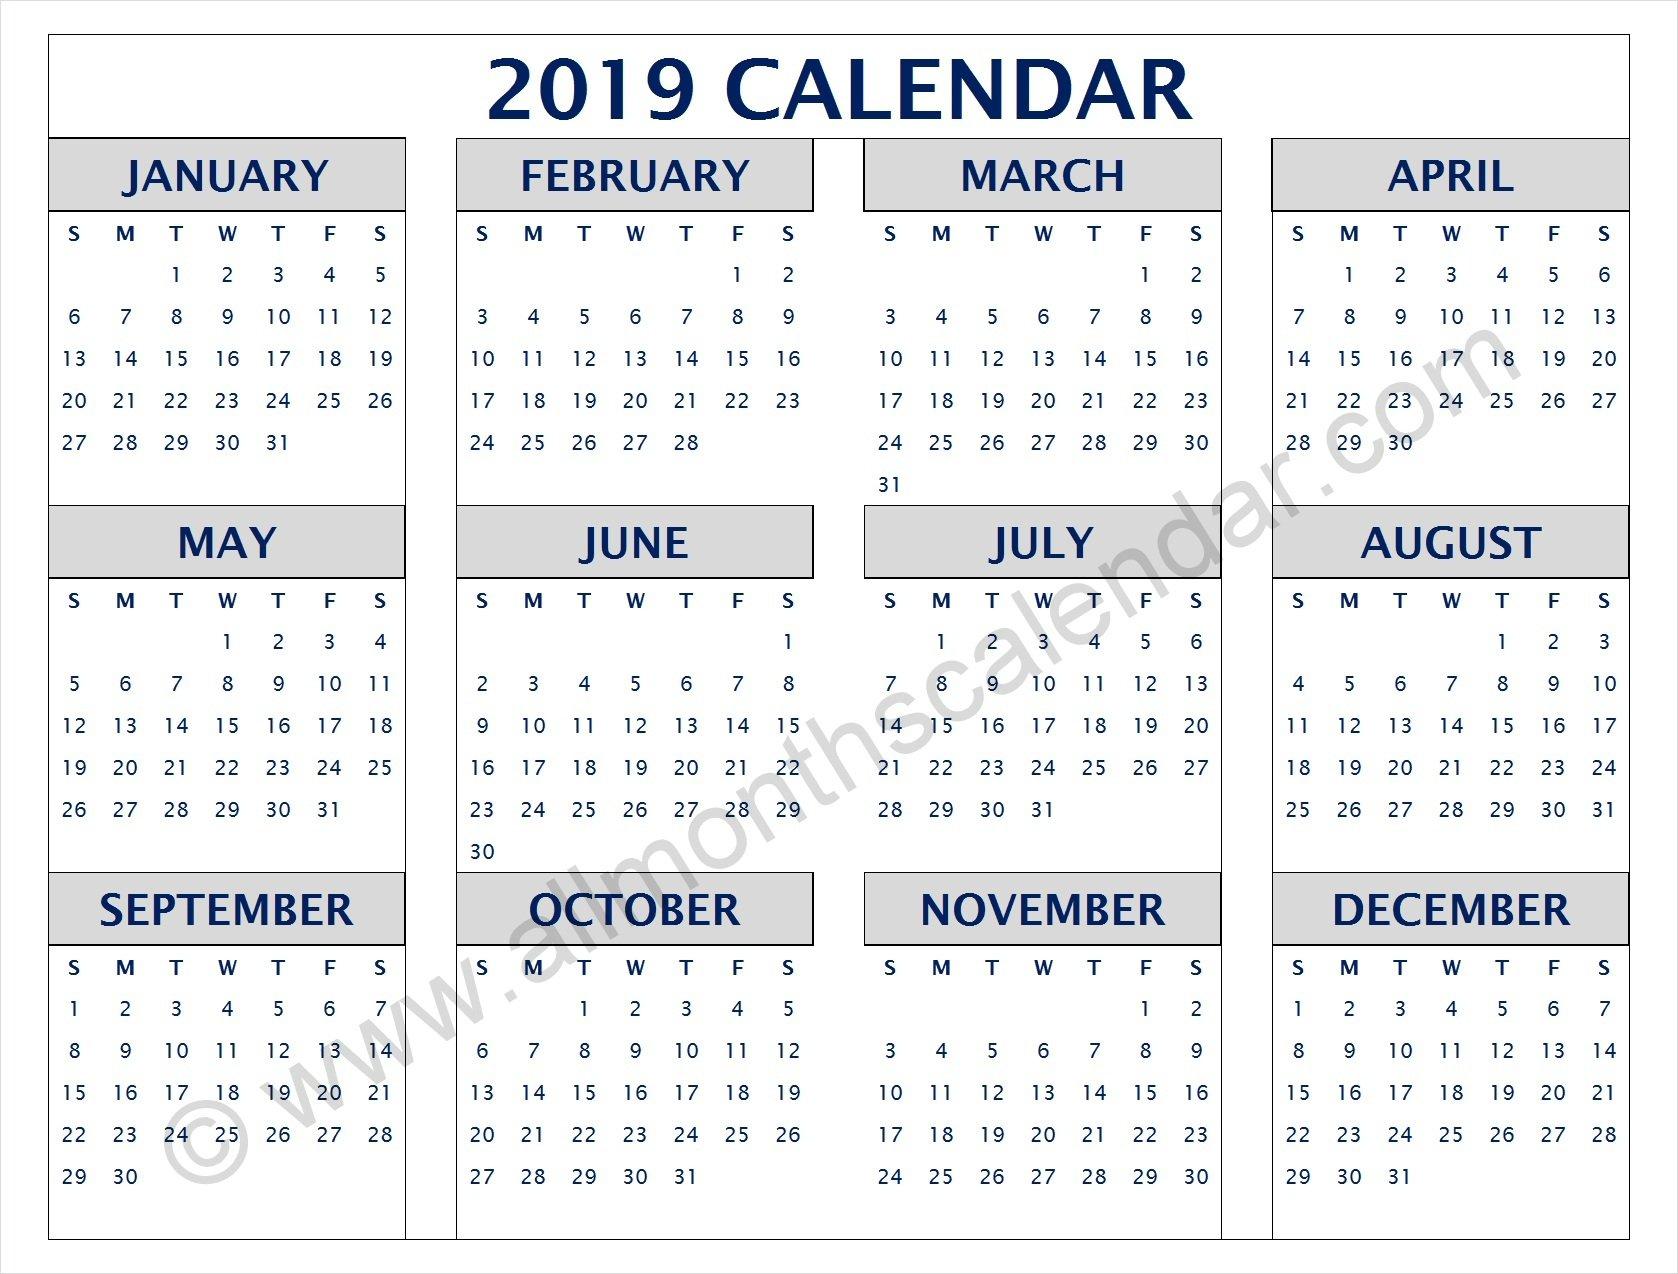 Yearly 2019 Calendar Pdf | 12 Month 2019 Calendar Printable Calendar Of 2019 Pdf